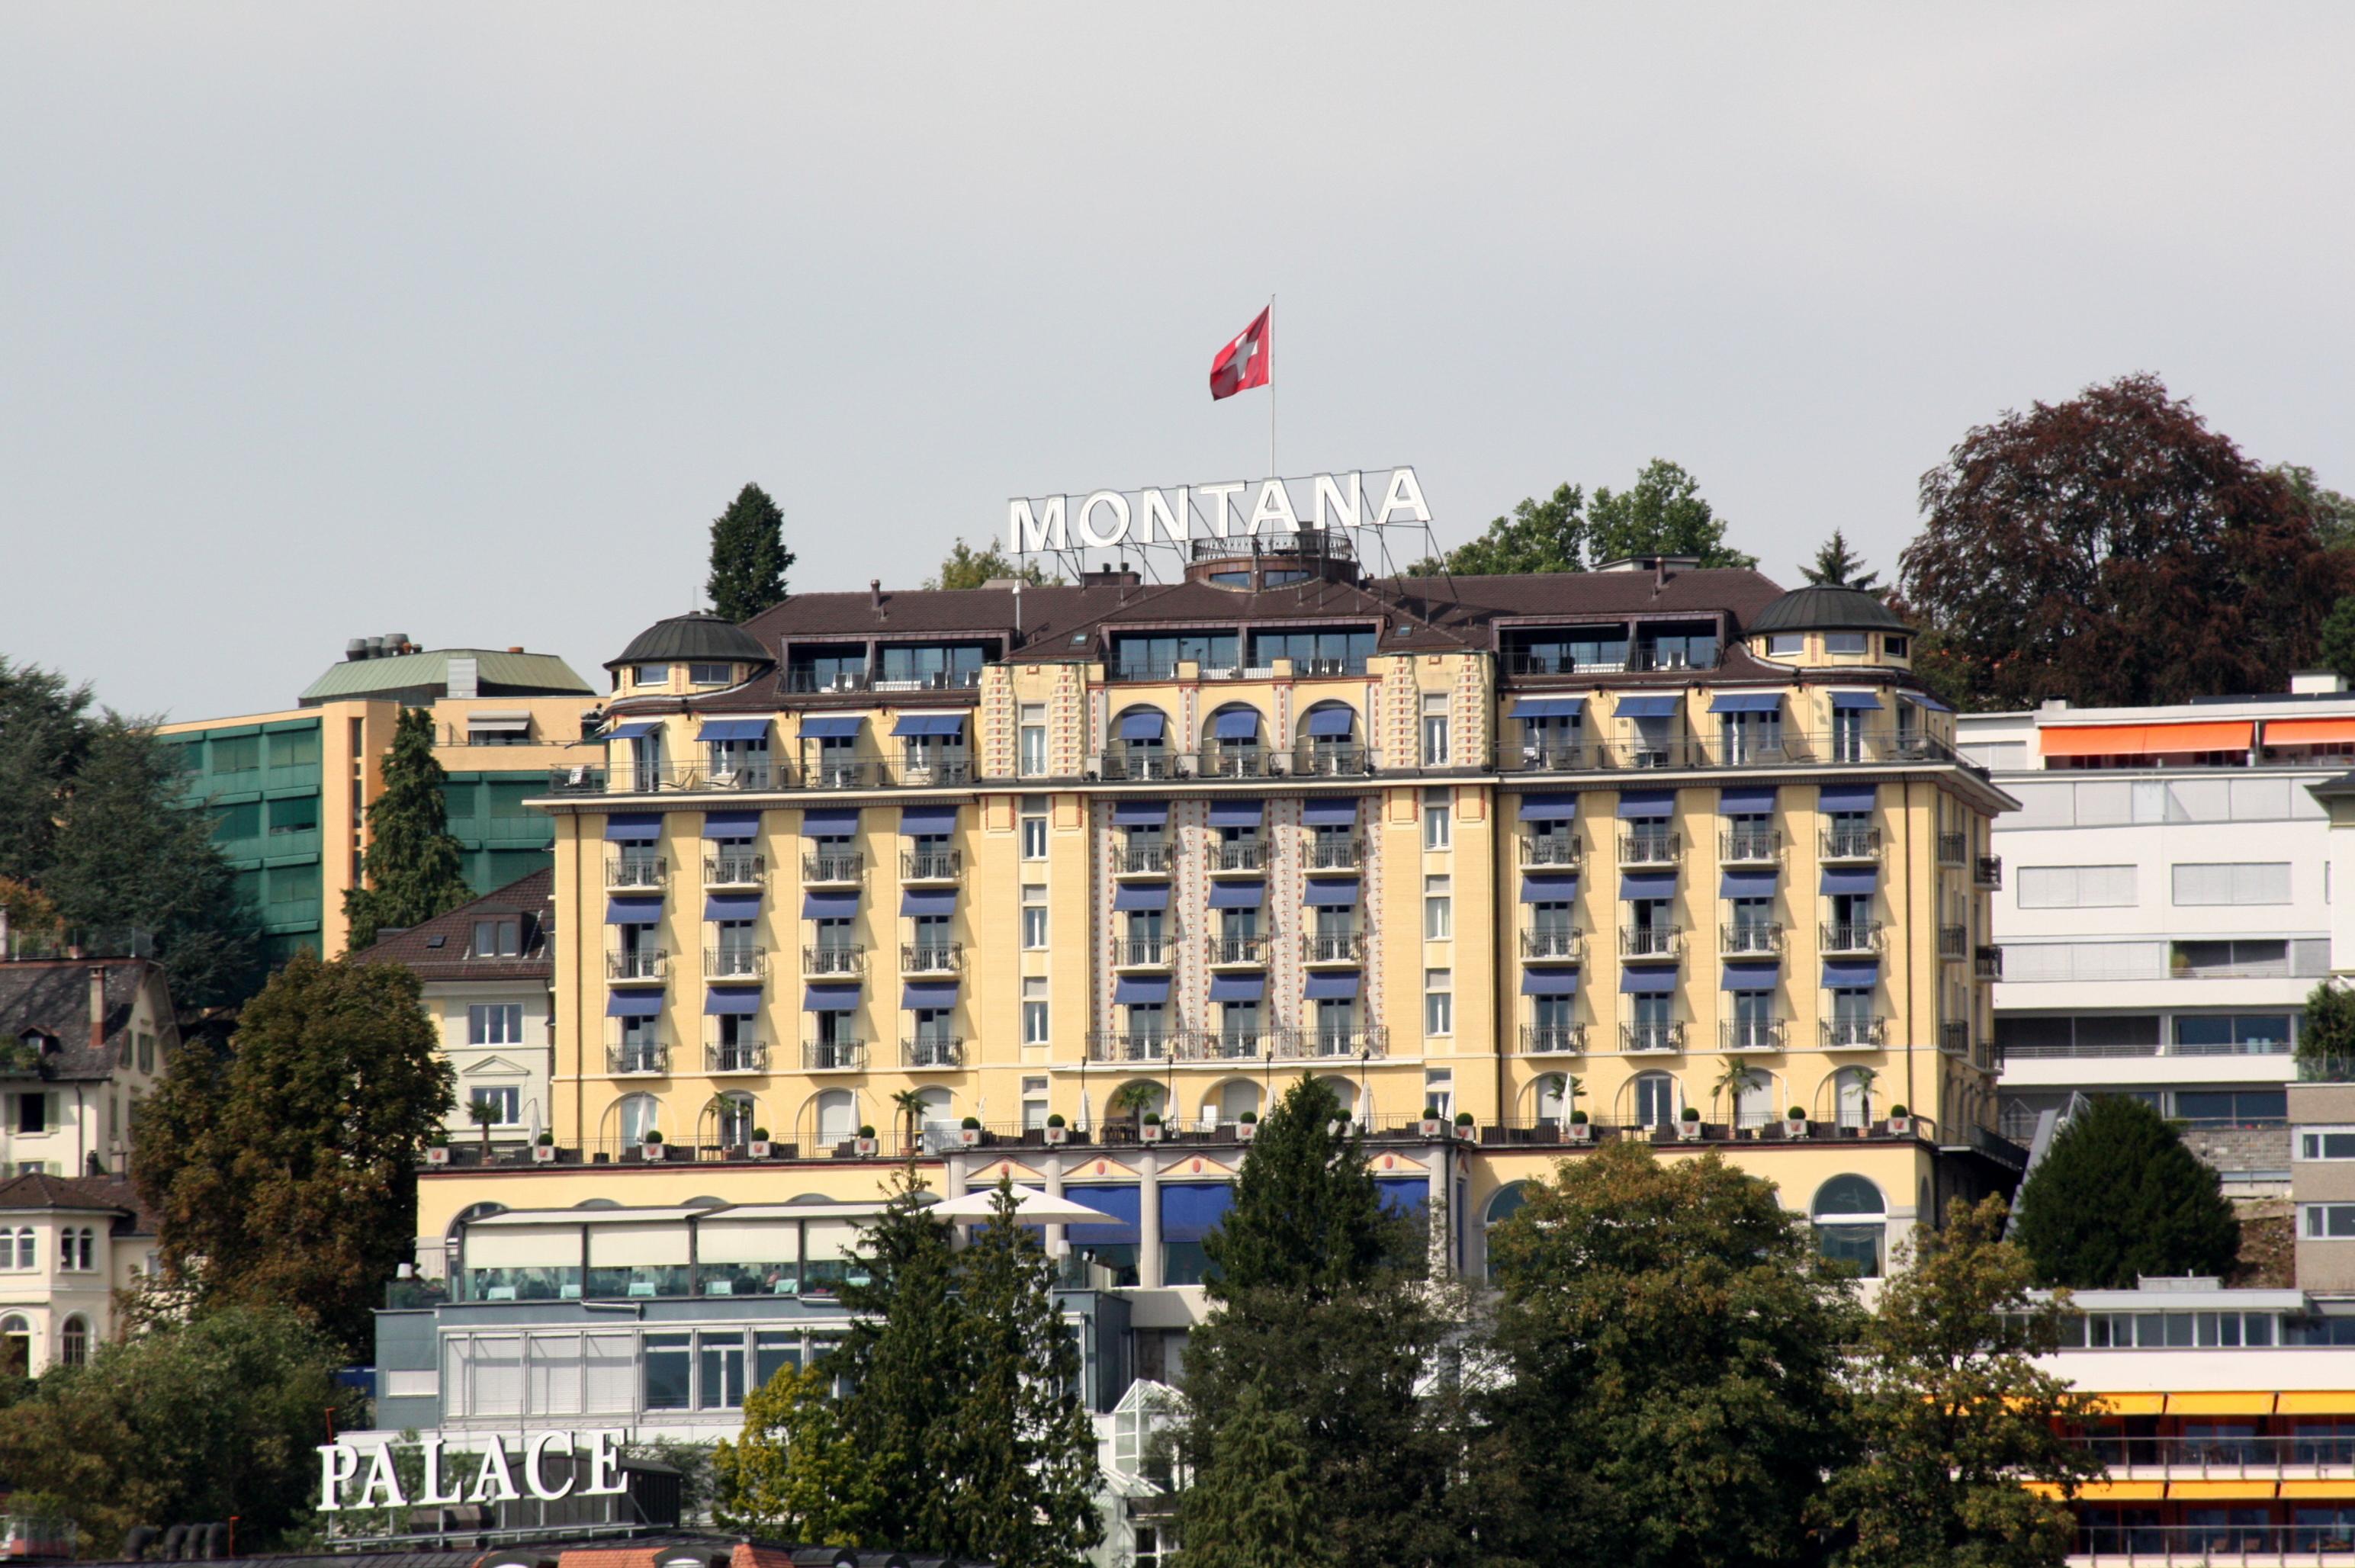 The Montana Hotel London